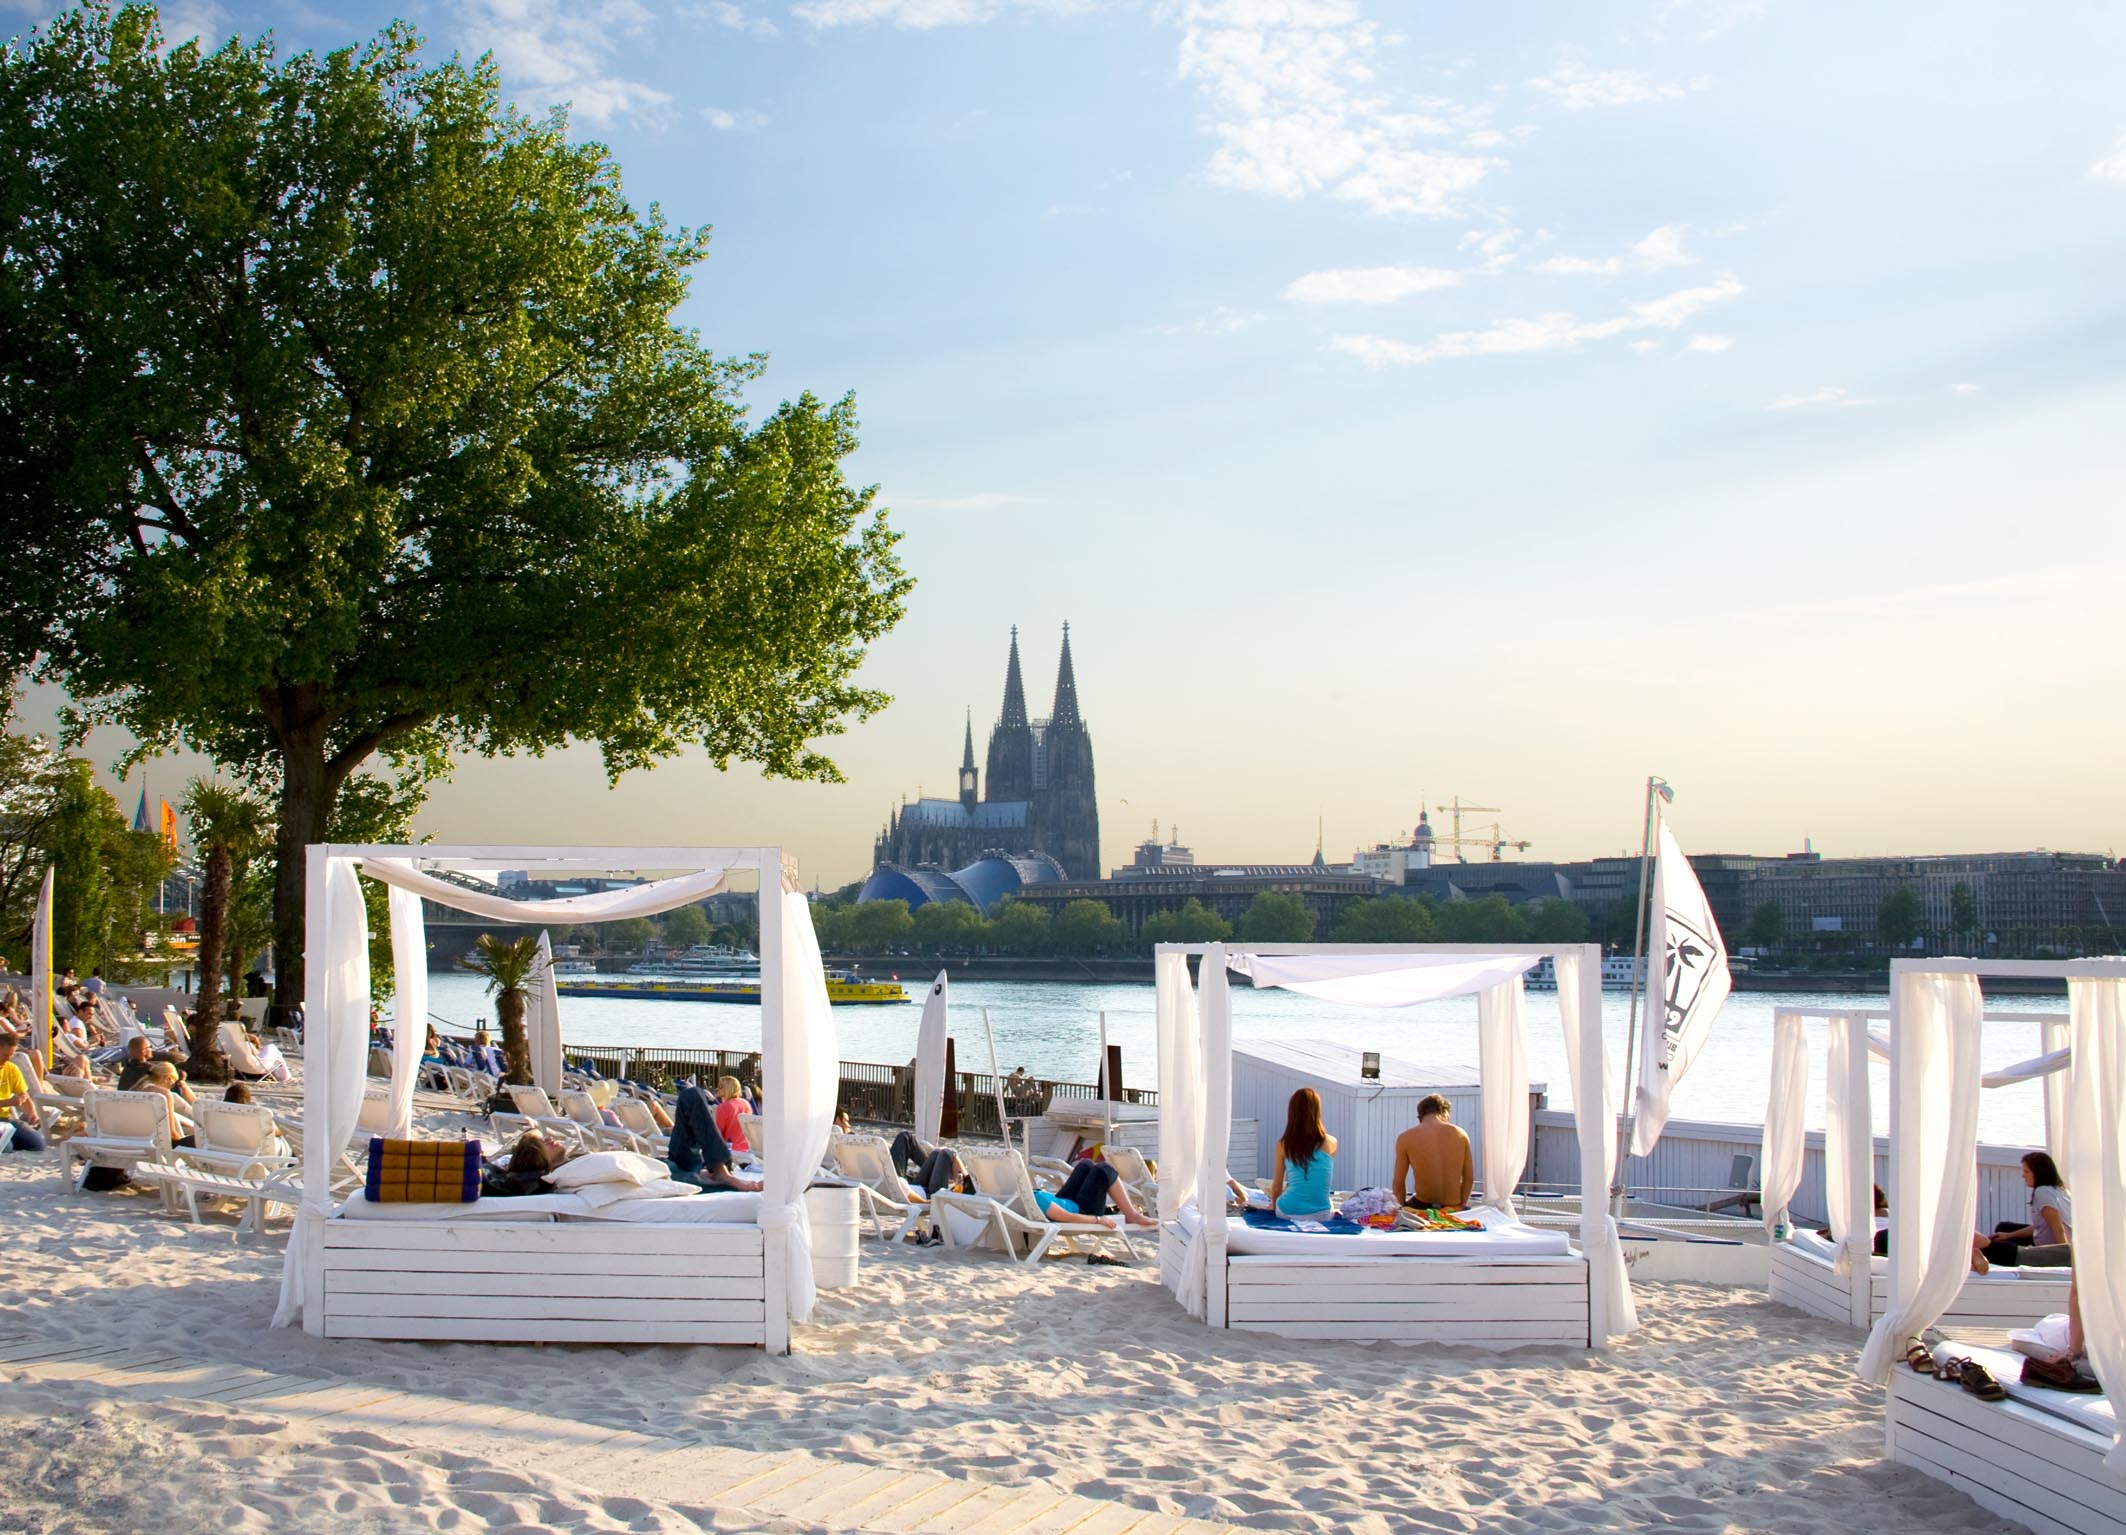 Hotel Restaurant Piscine Et Spa Finist Ef Bf Bdre